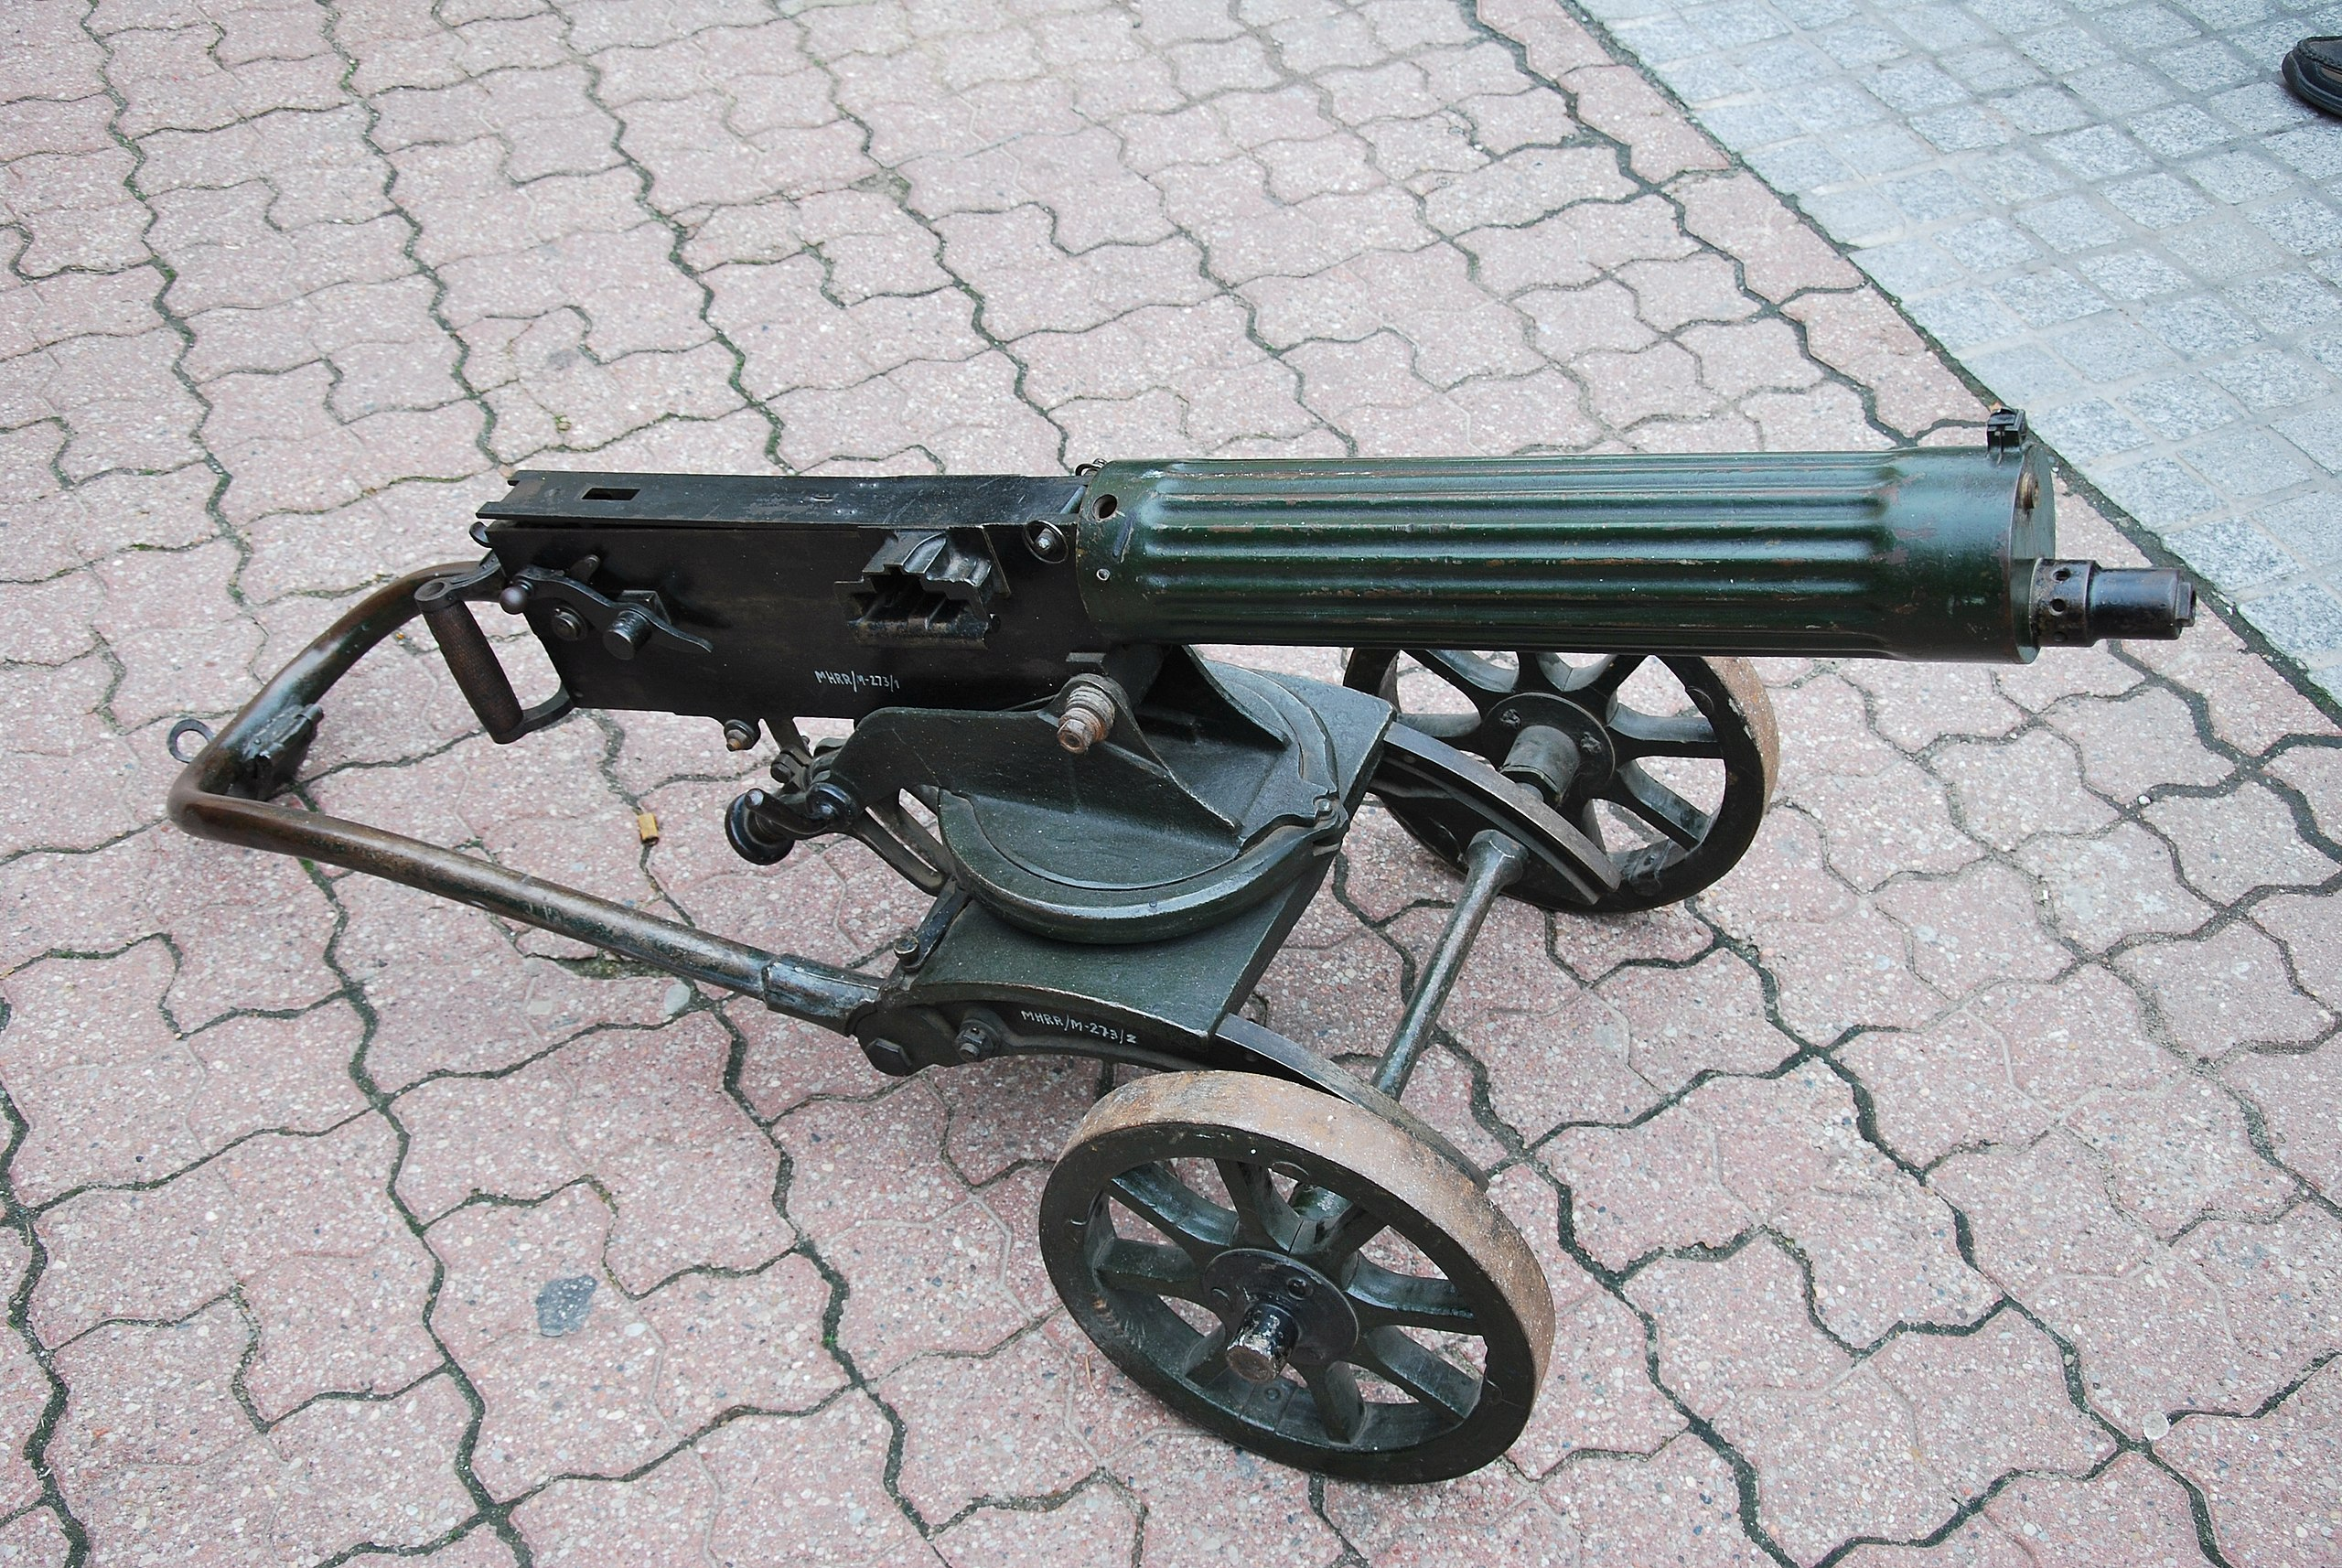 The Maxim Gun's devastating firepower changed warfare forever